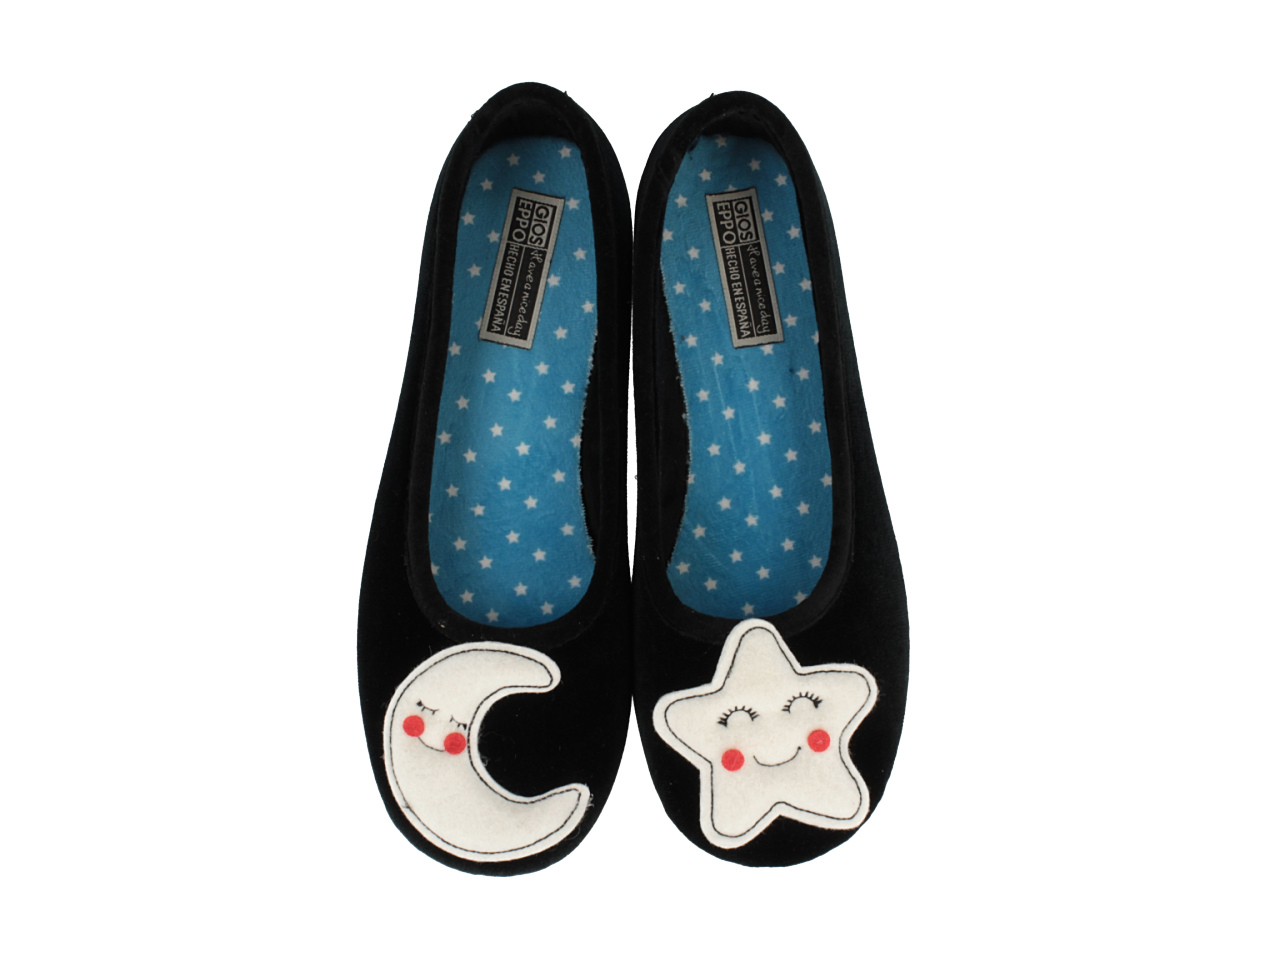 Pantofole calde Gioseppo